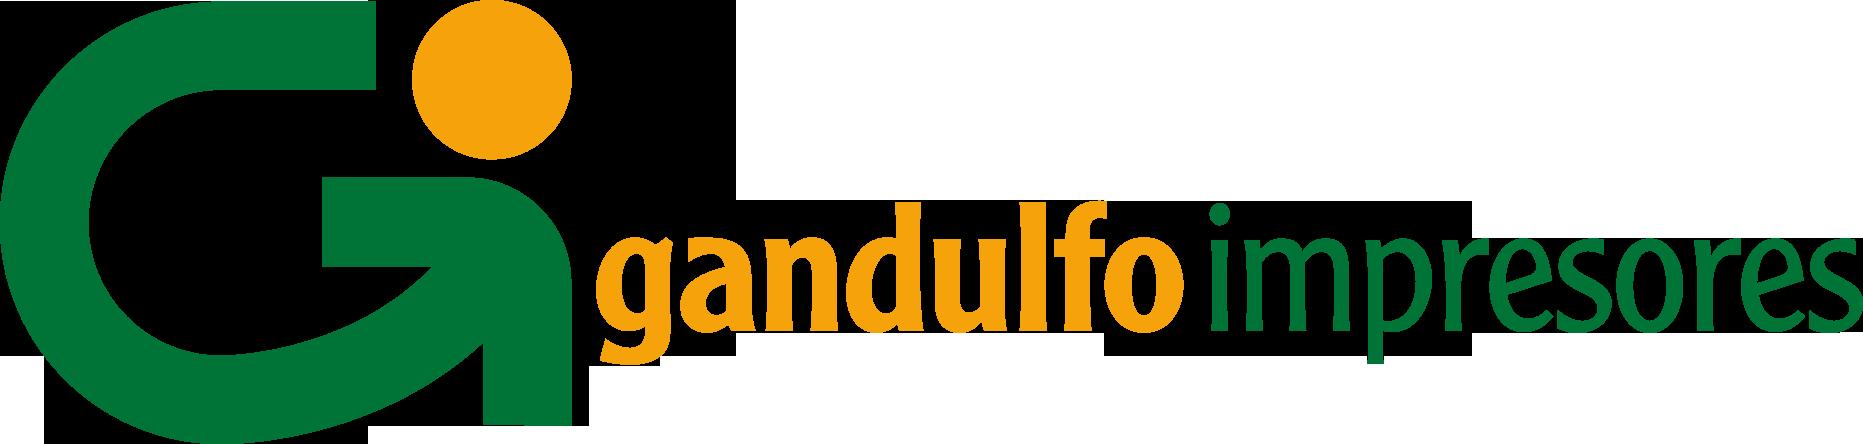 Gandulfo impresores Sevilla